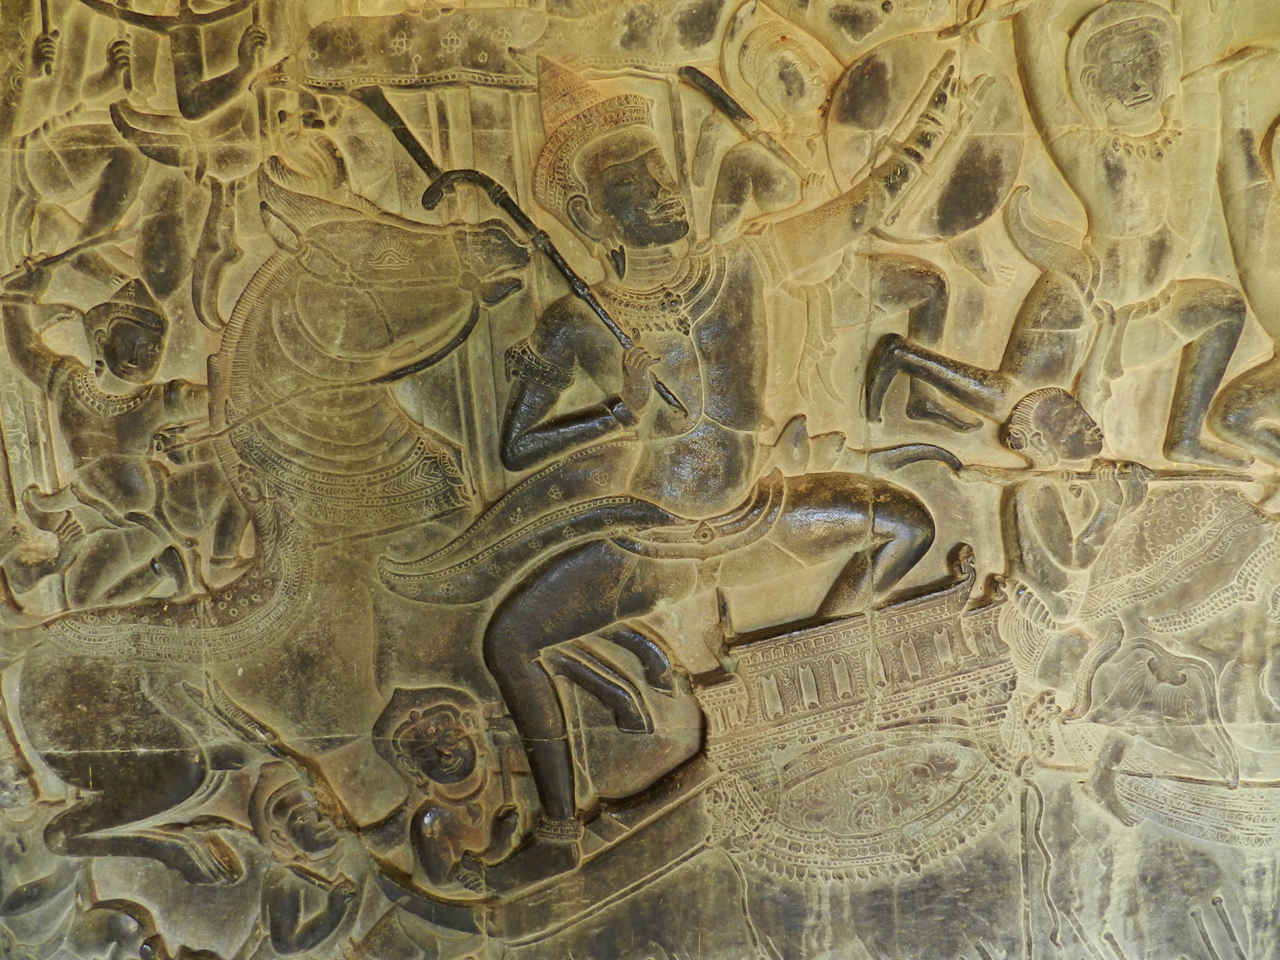 Bas-relief of war scenes at Angkor Wat